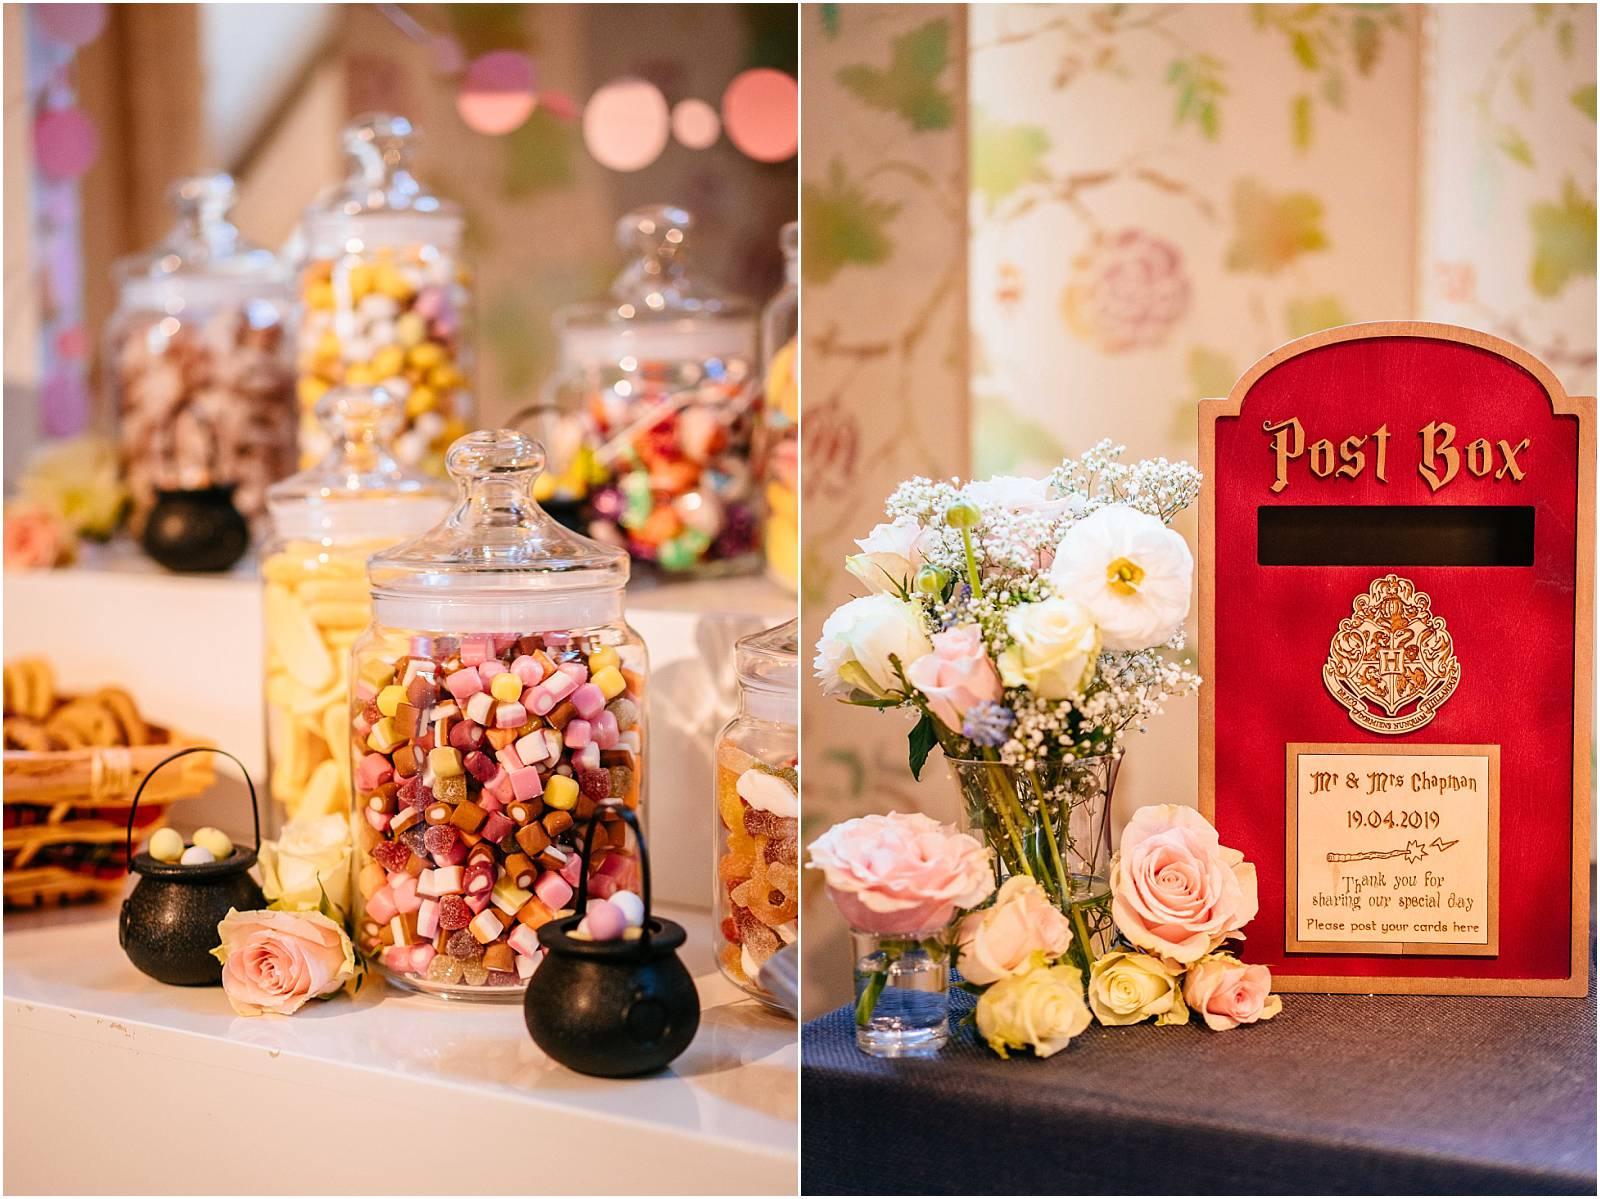 harry potter card post box at wedding